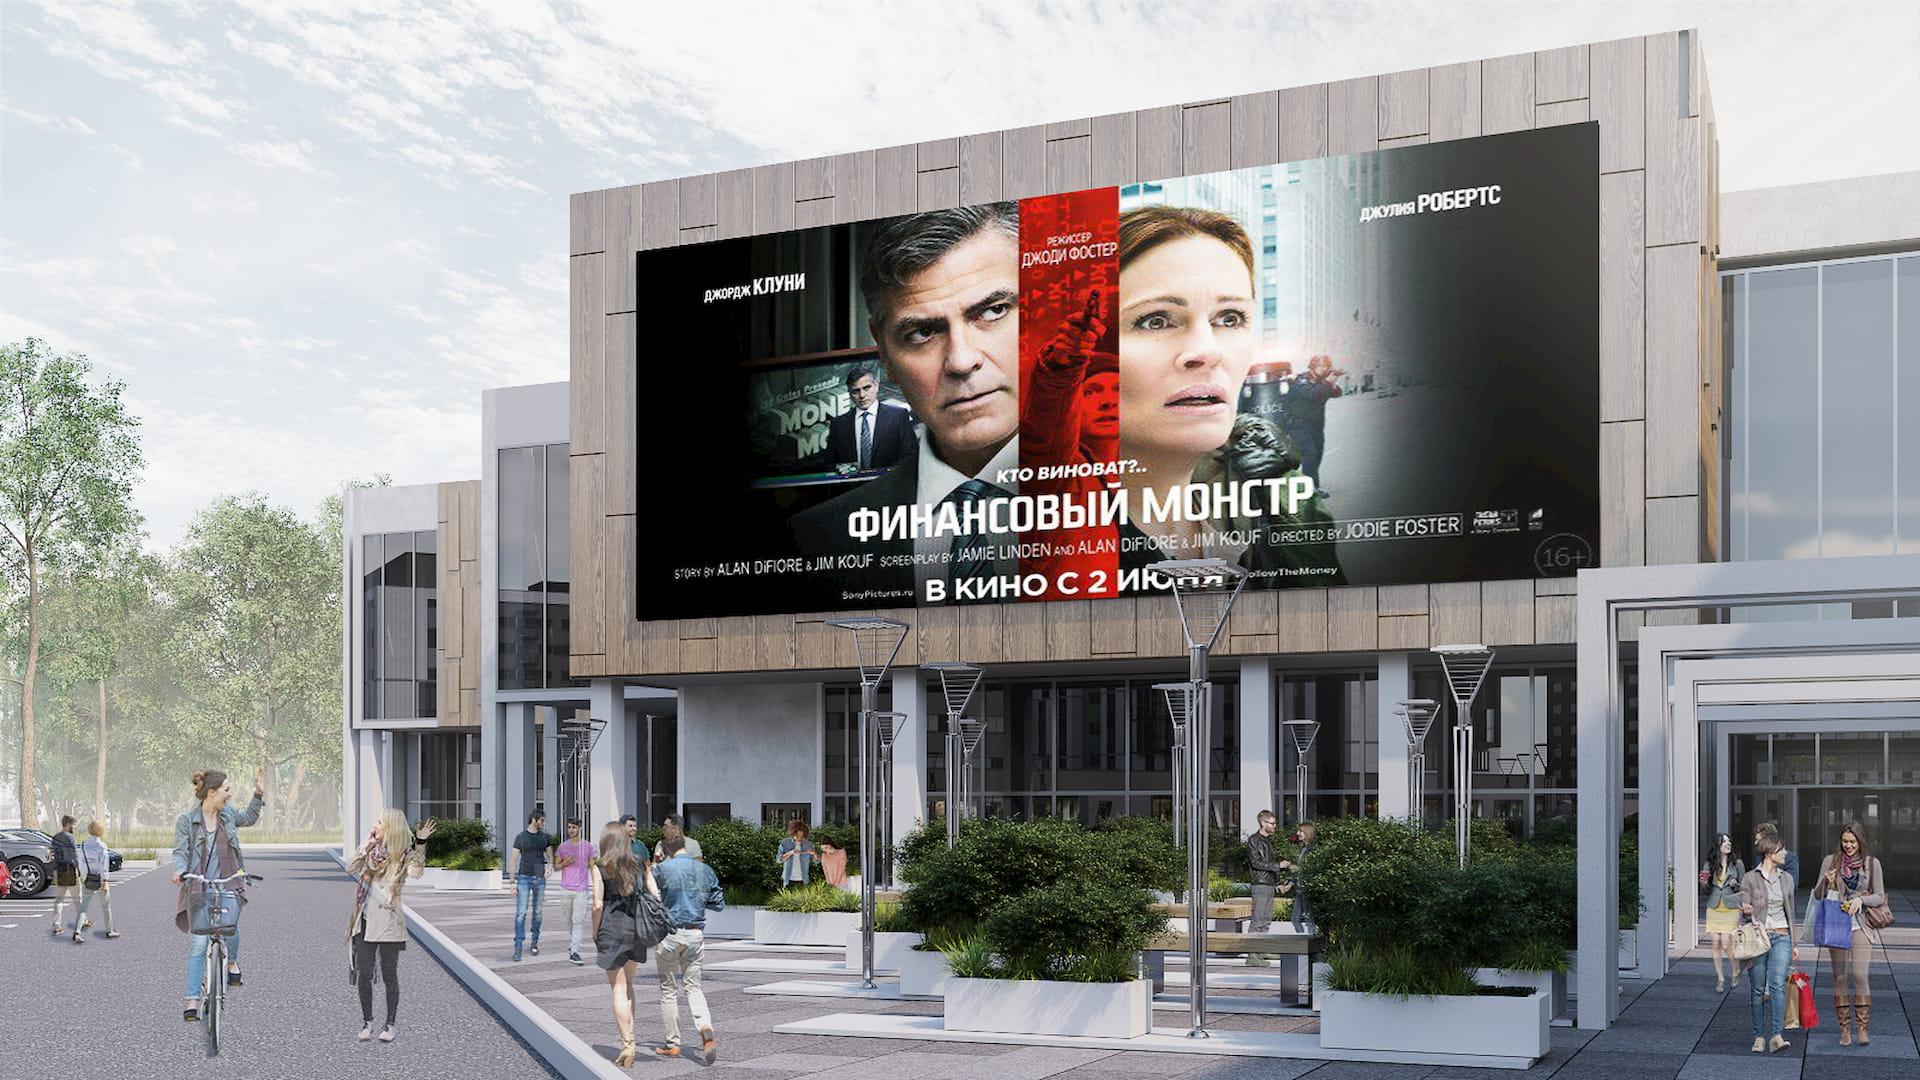 torgovyj-centr-v-novoj-moskve (14)